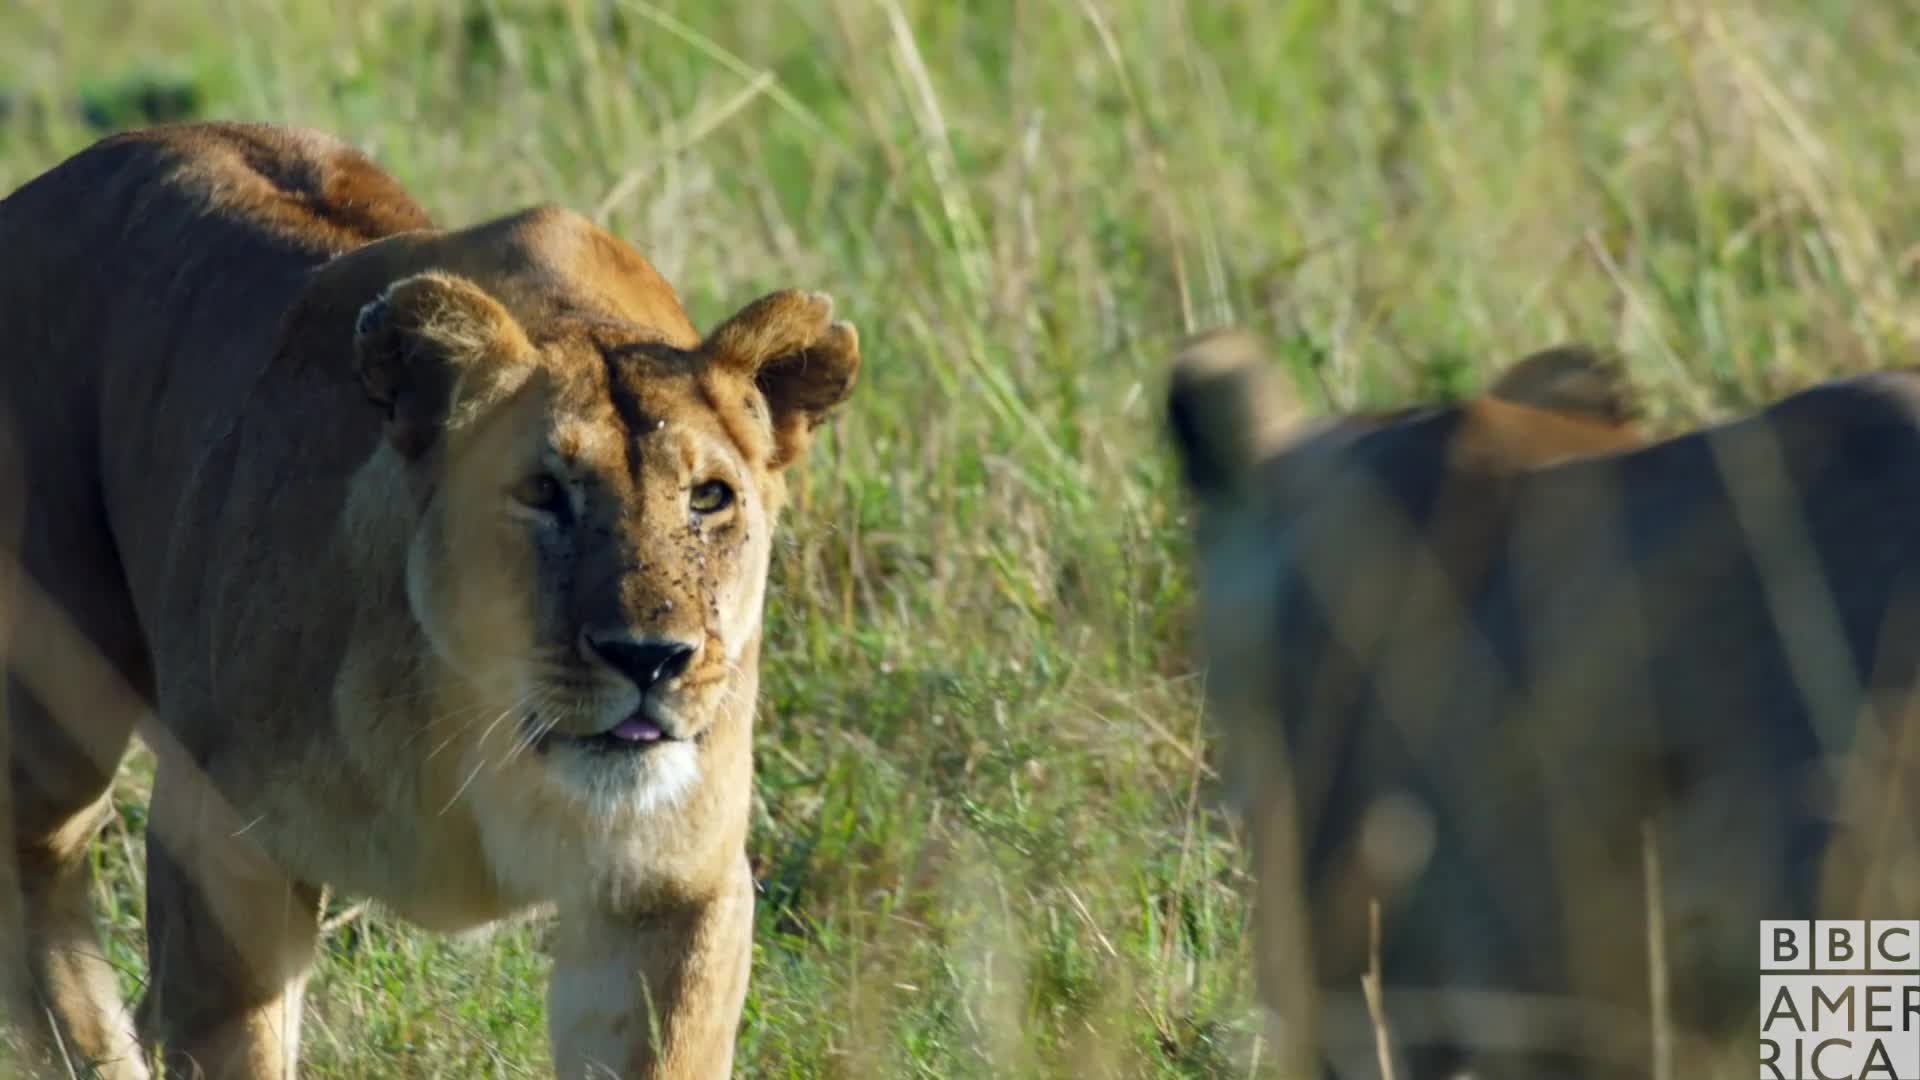 animal, animals, awww, bbc america, bbc america: dynasties, cute, dynasties, hug, hugs, lion, lions, love, Dynasties Lioness Mother Daughter Love GIFs